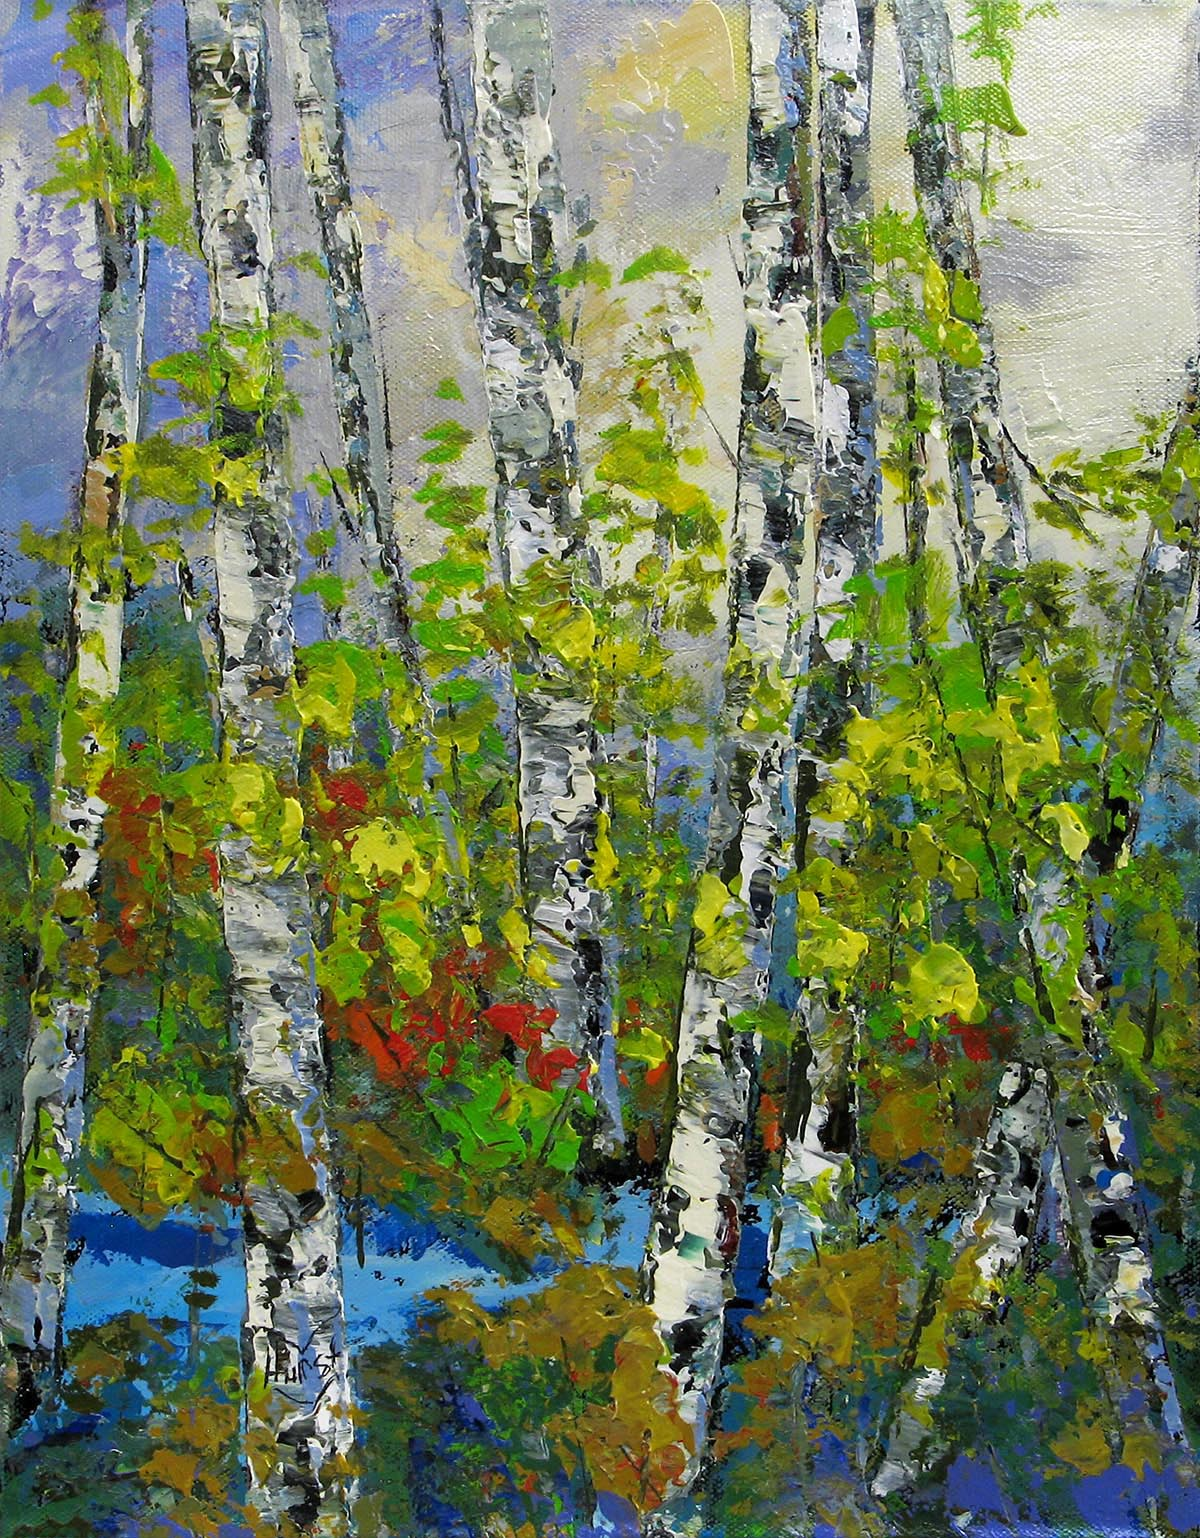 Sound of Silence - Marilyn Hurst